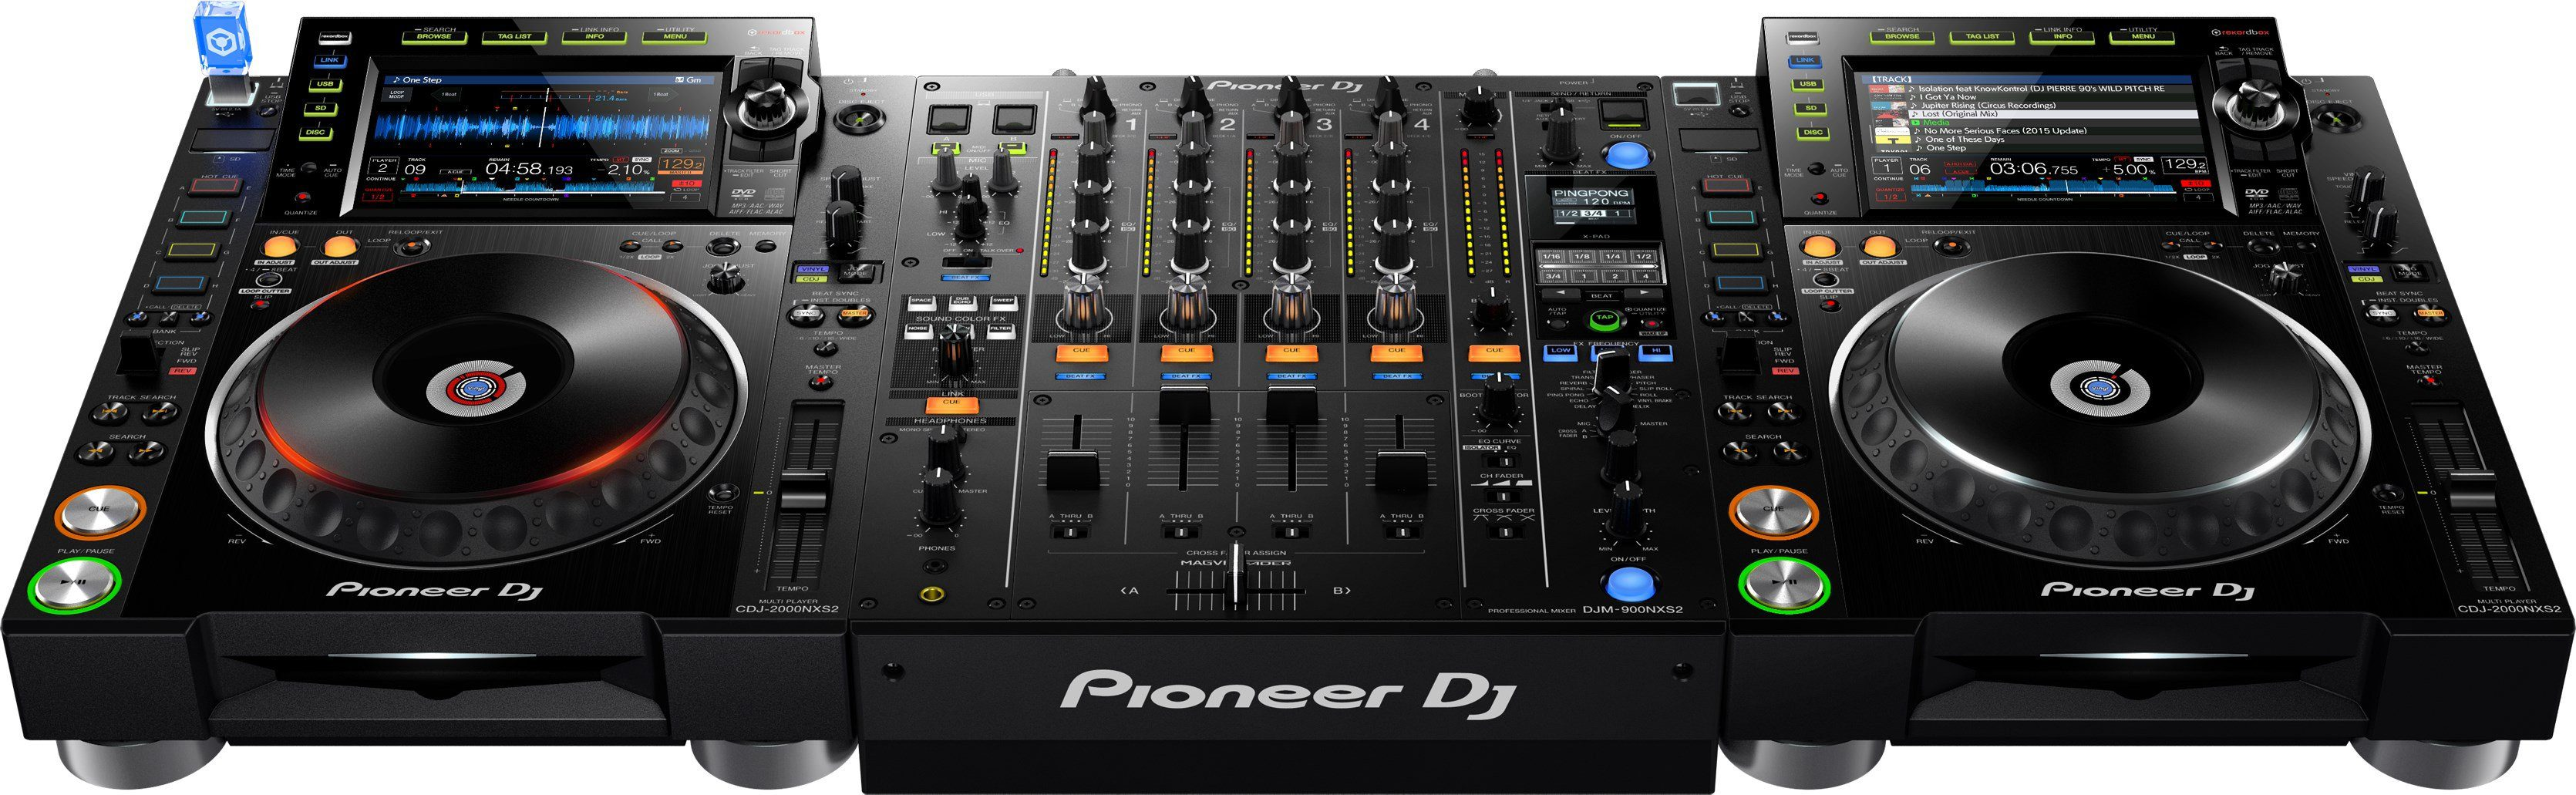 Top News: Pioneer CDJ-2000NXS2 und Pioneer DJM-900NXS2, DJ ...